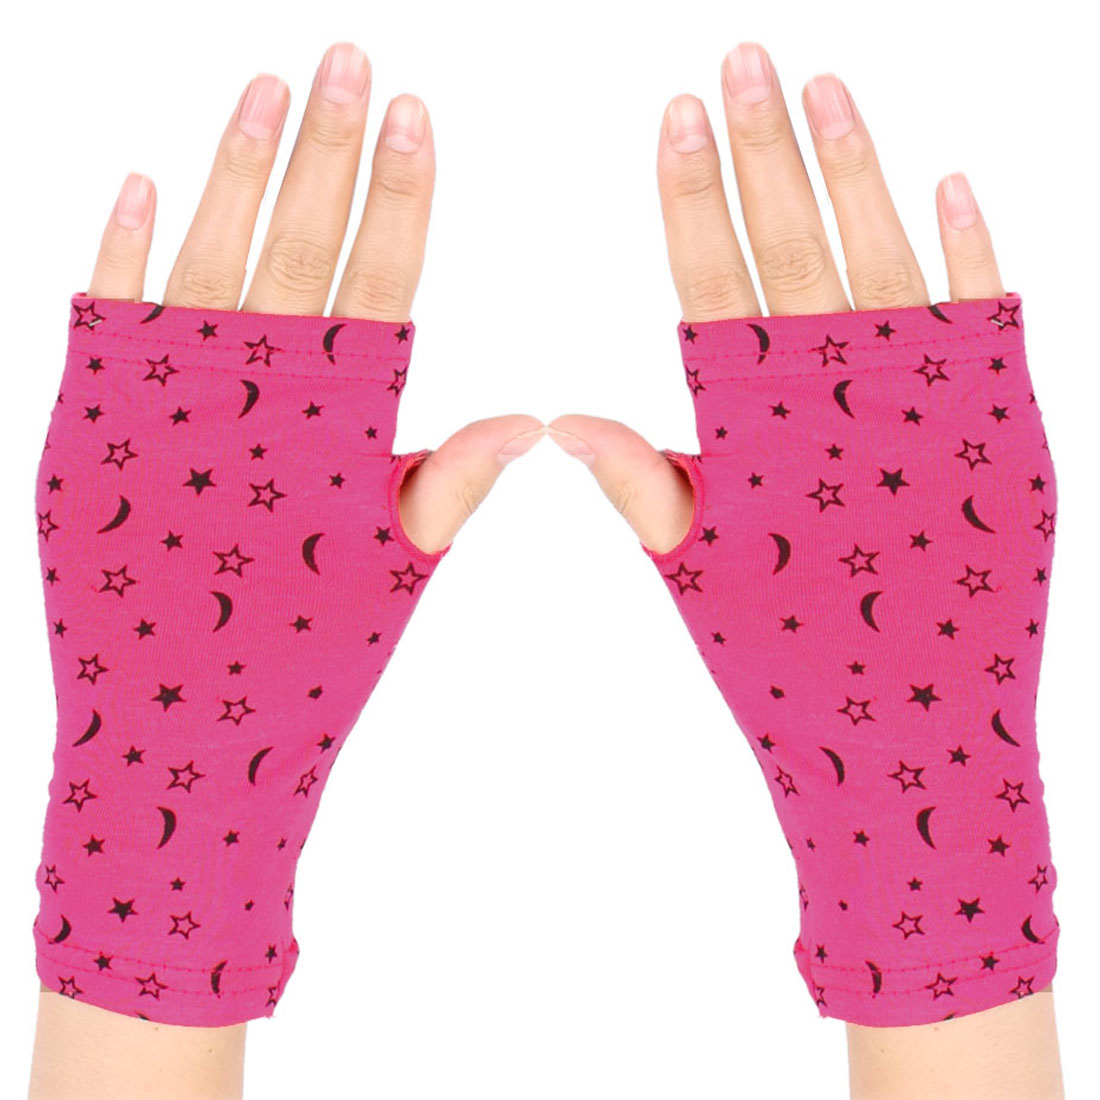 Women Black Stars Pattern Short Wrist Fingerless Gloves Mittens Fuchsia Pair